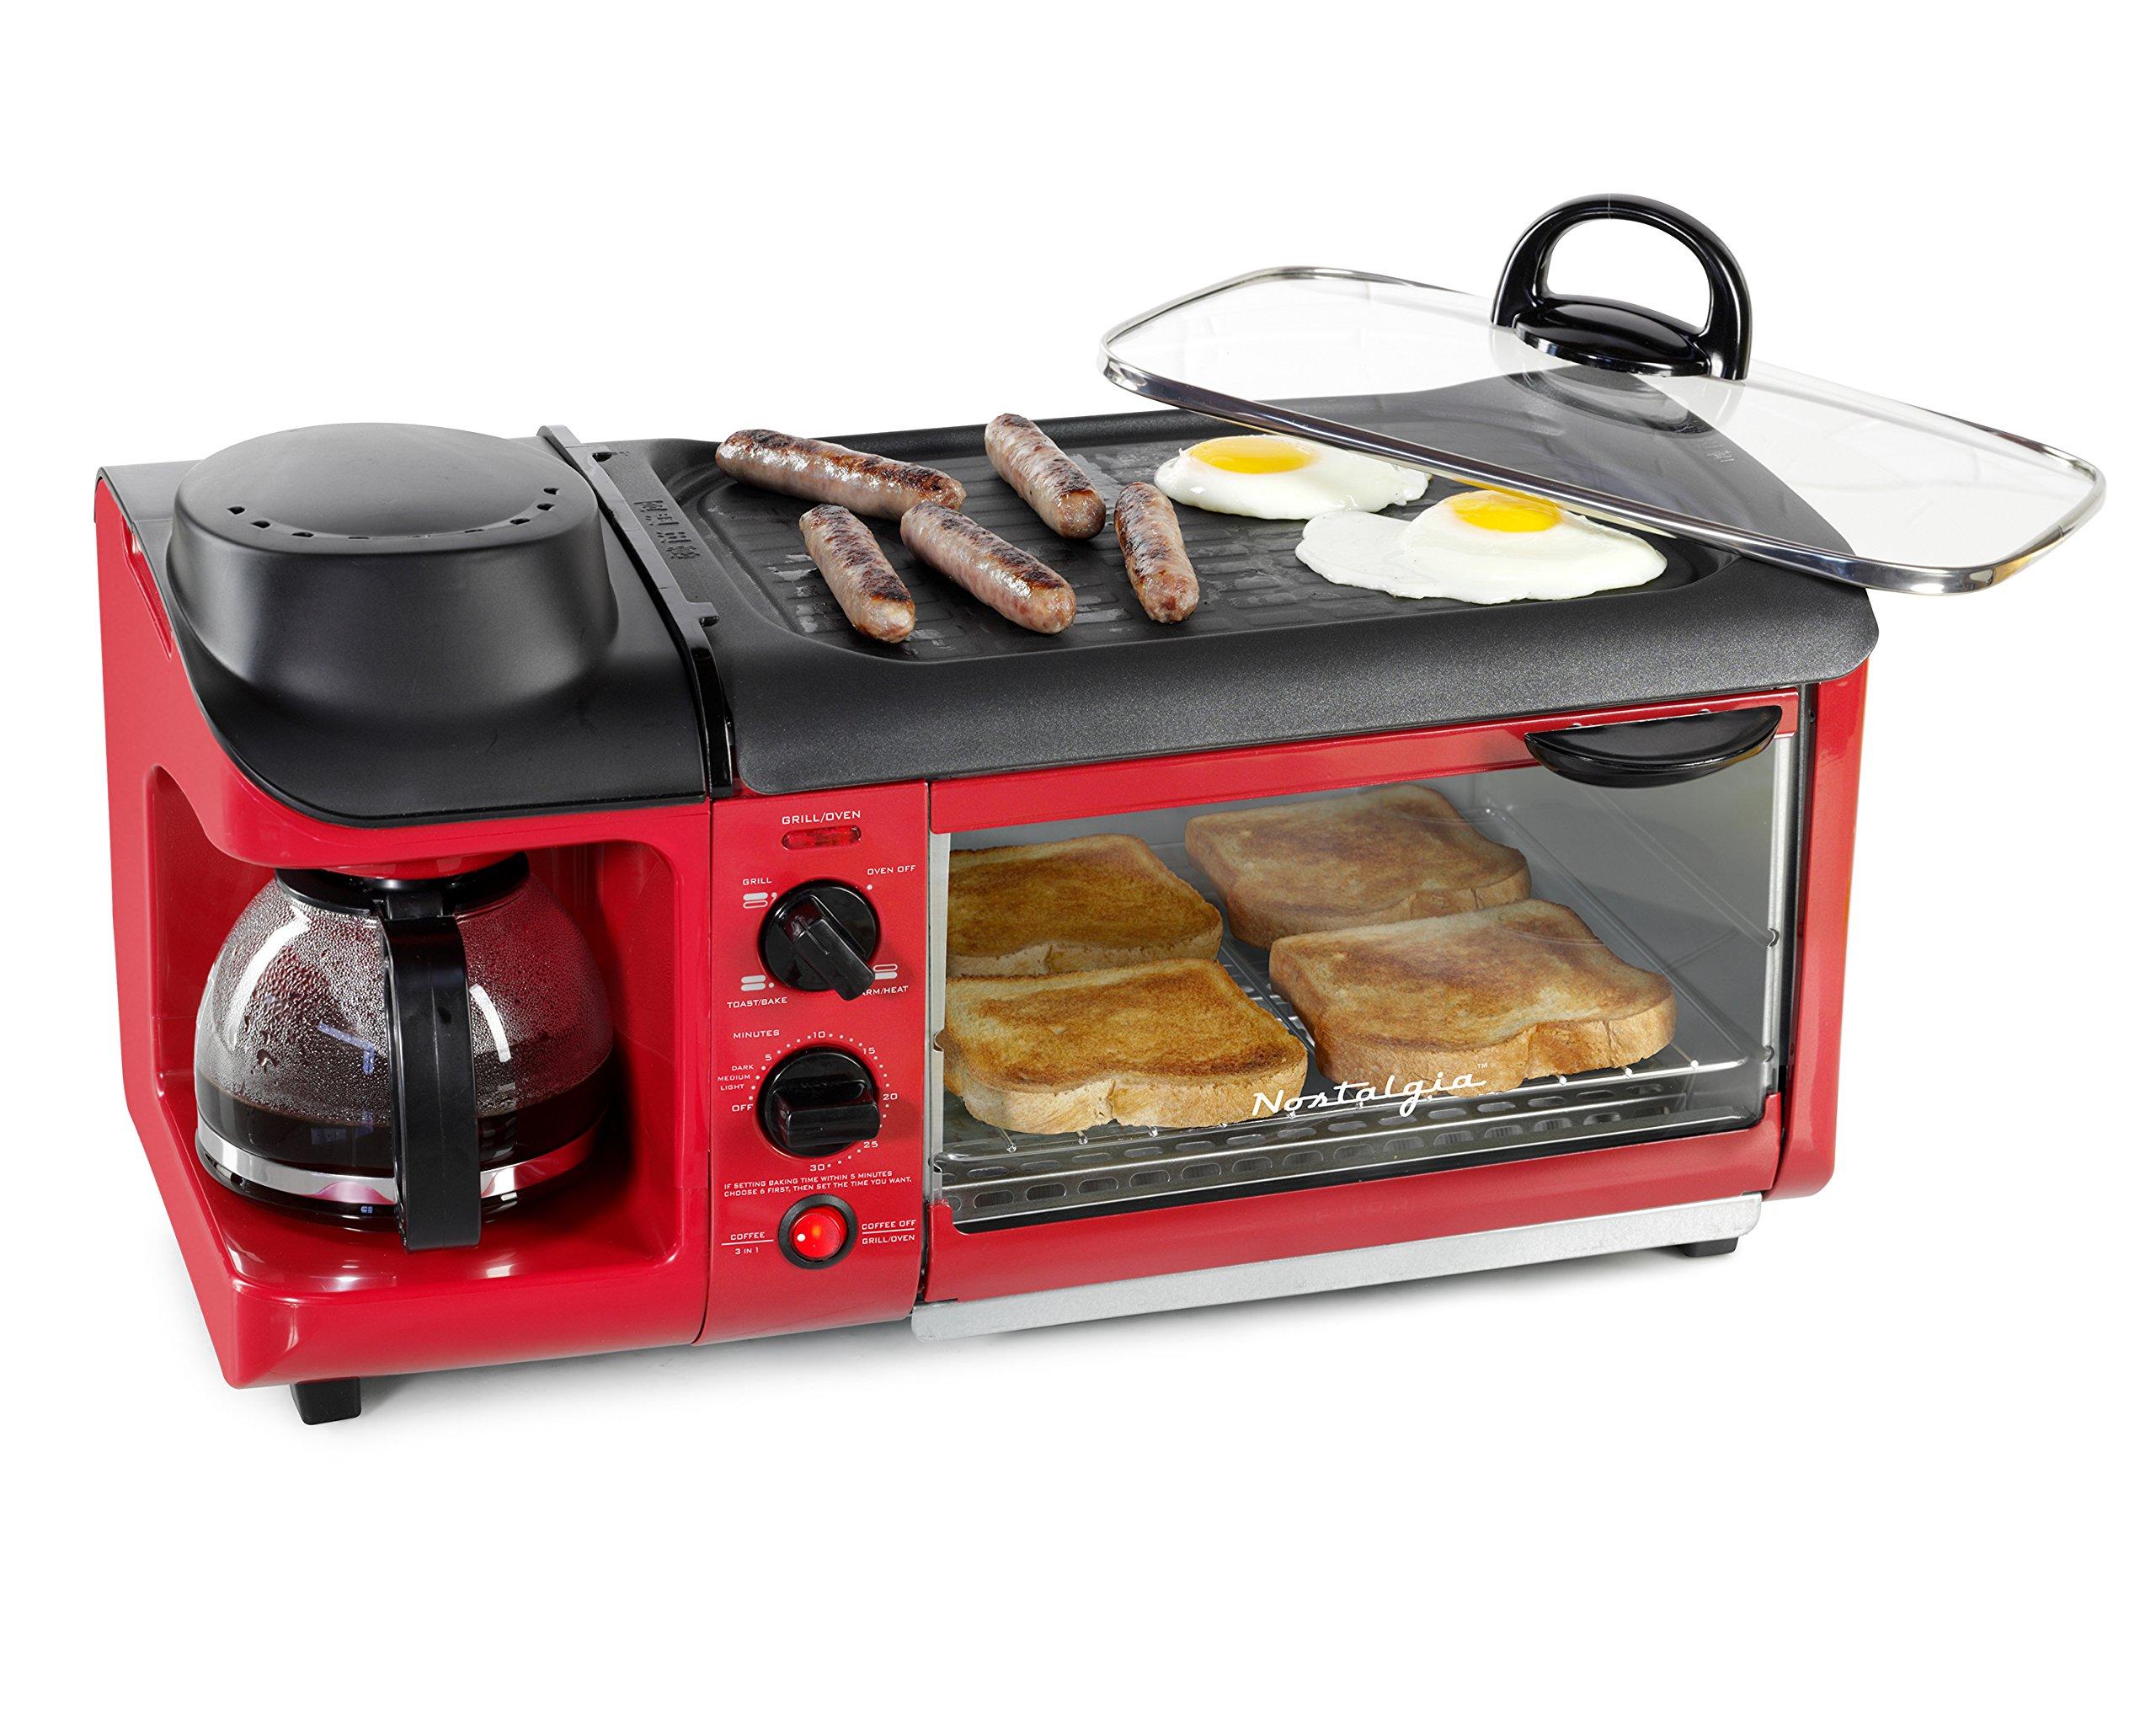 Nostalgia BSET300RETRORED 3-in-1 Family Size Breakfast Station, Red by NOSTALGIA